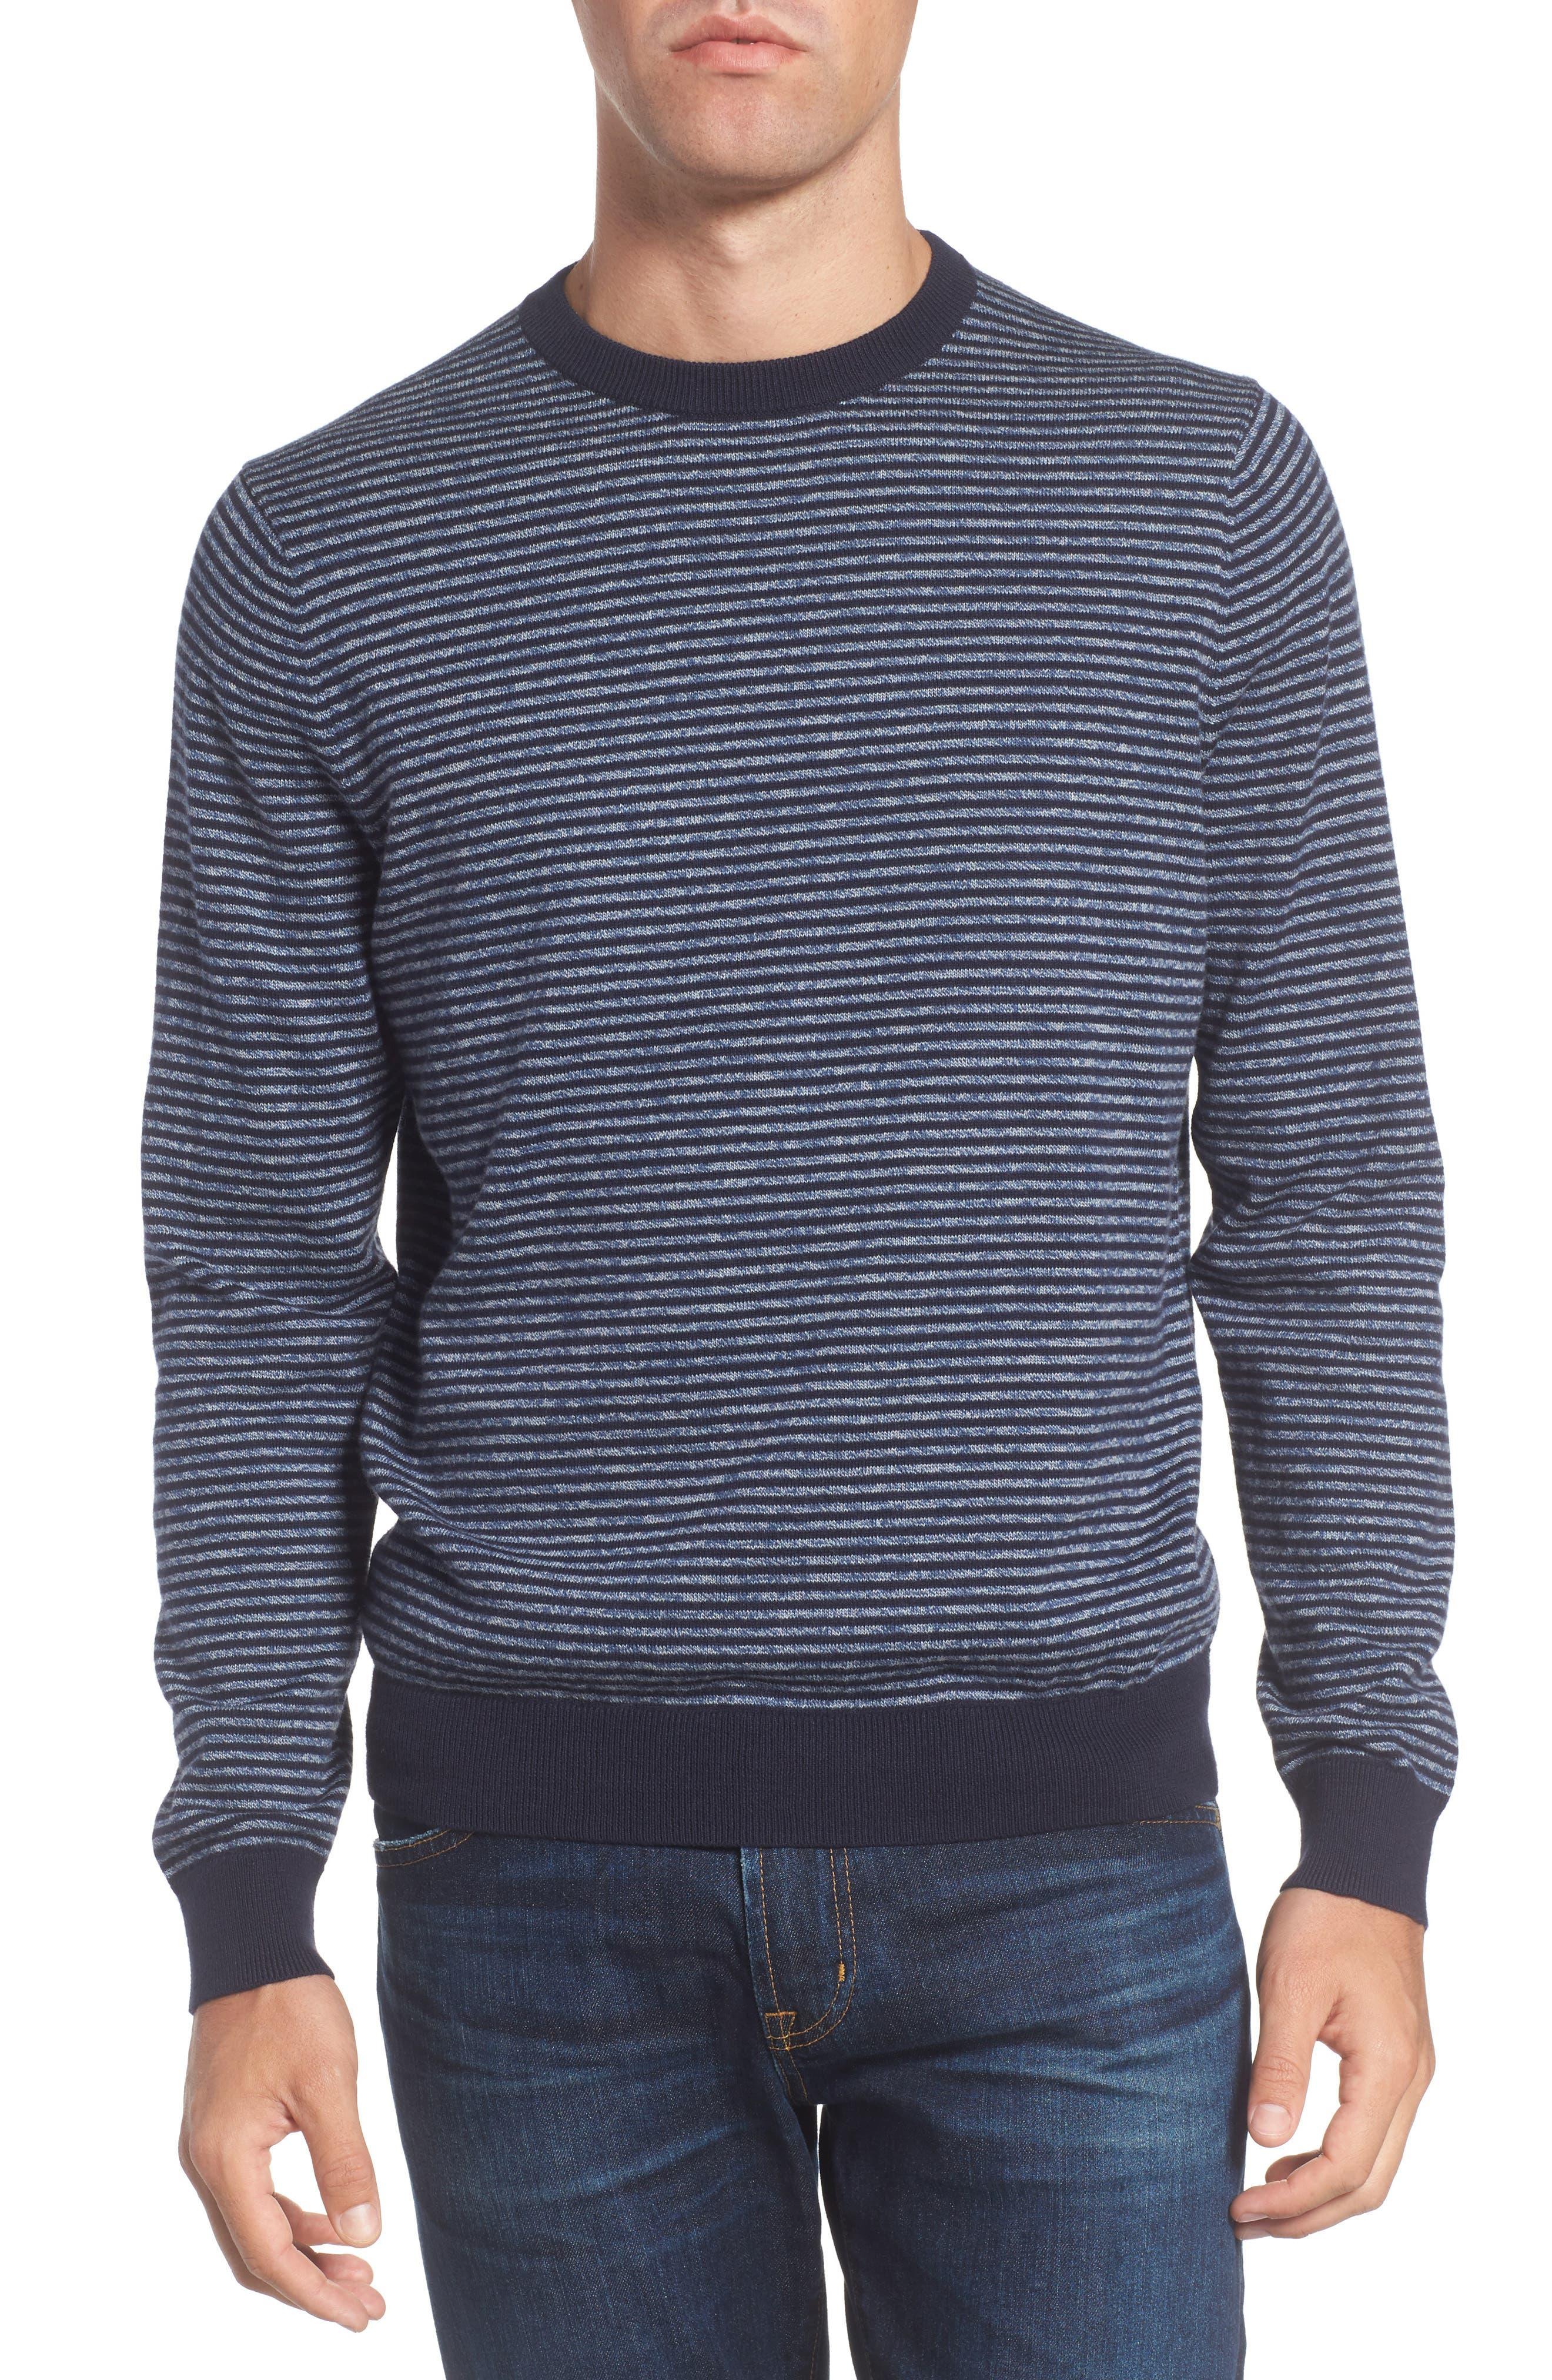 Stripe Cotton & Cashmere Crewneck Sweater,                             Main thumbnail 1, color,                             Navy Iris Jaspe Stripe